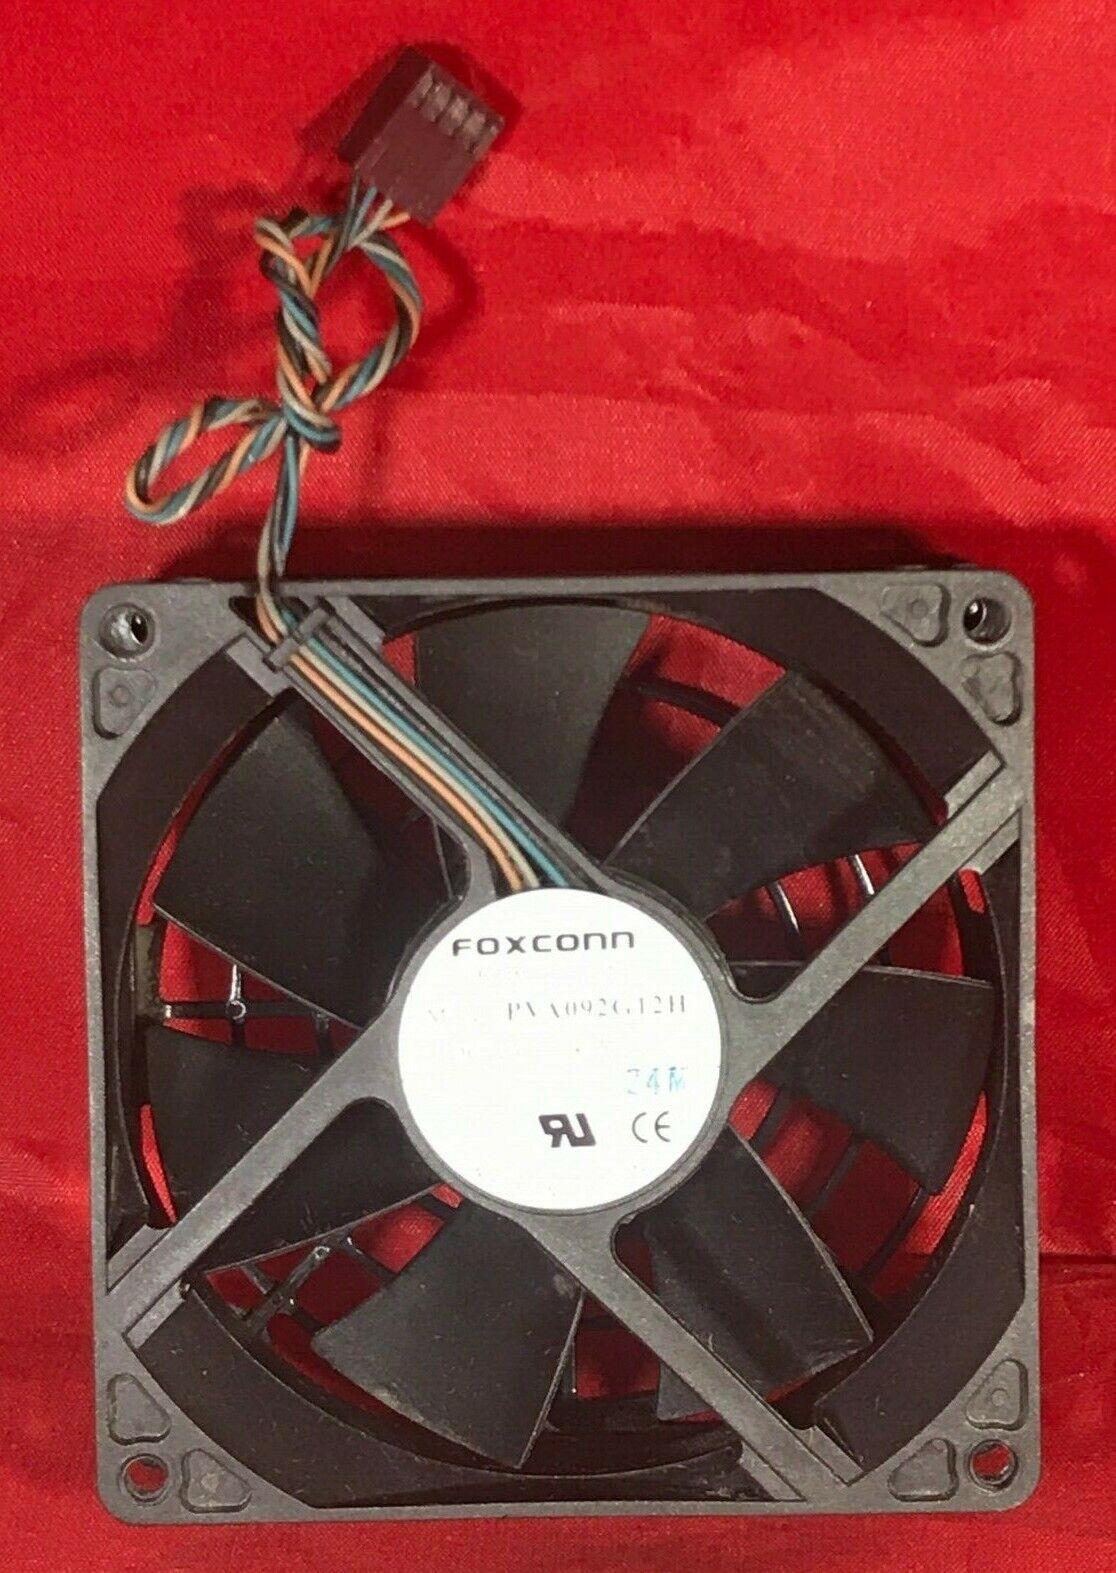 HP Elite 8300 8200 Pro 6200 6300 Cooling Fan Foxconn PVA092G12H 92x25mm 4wire